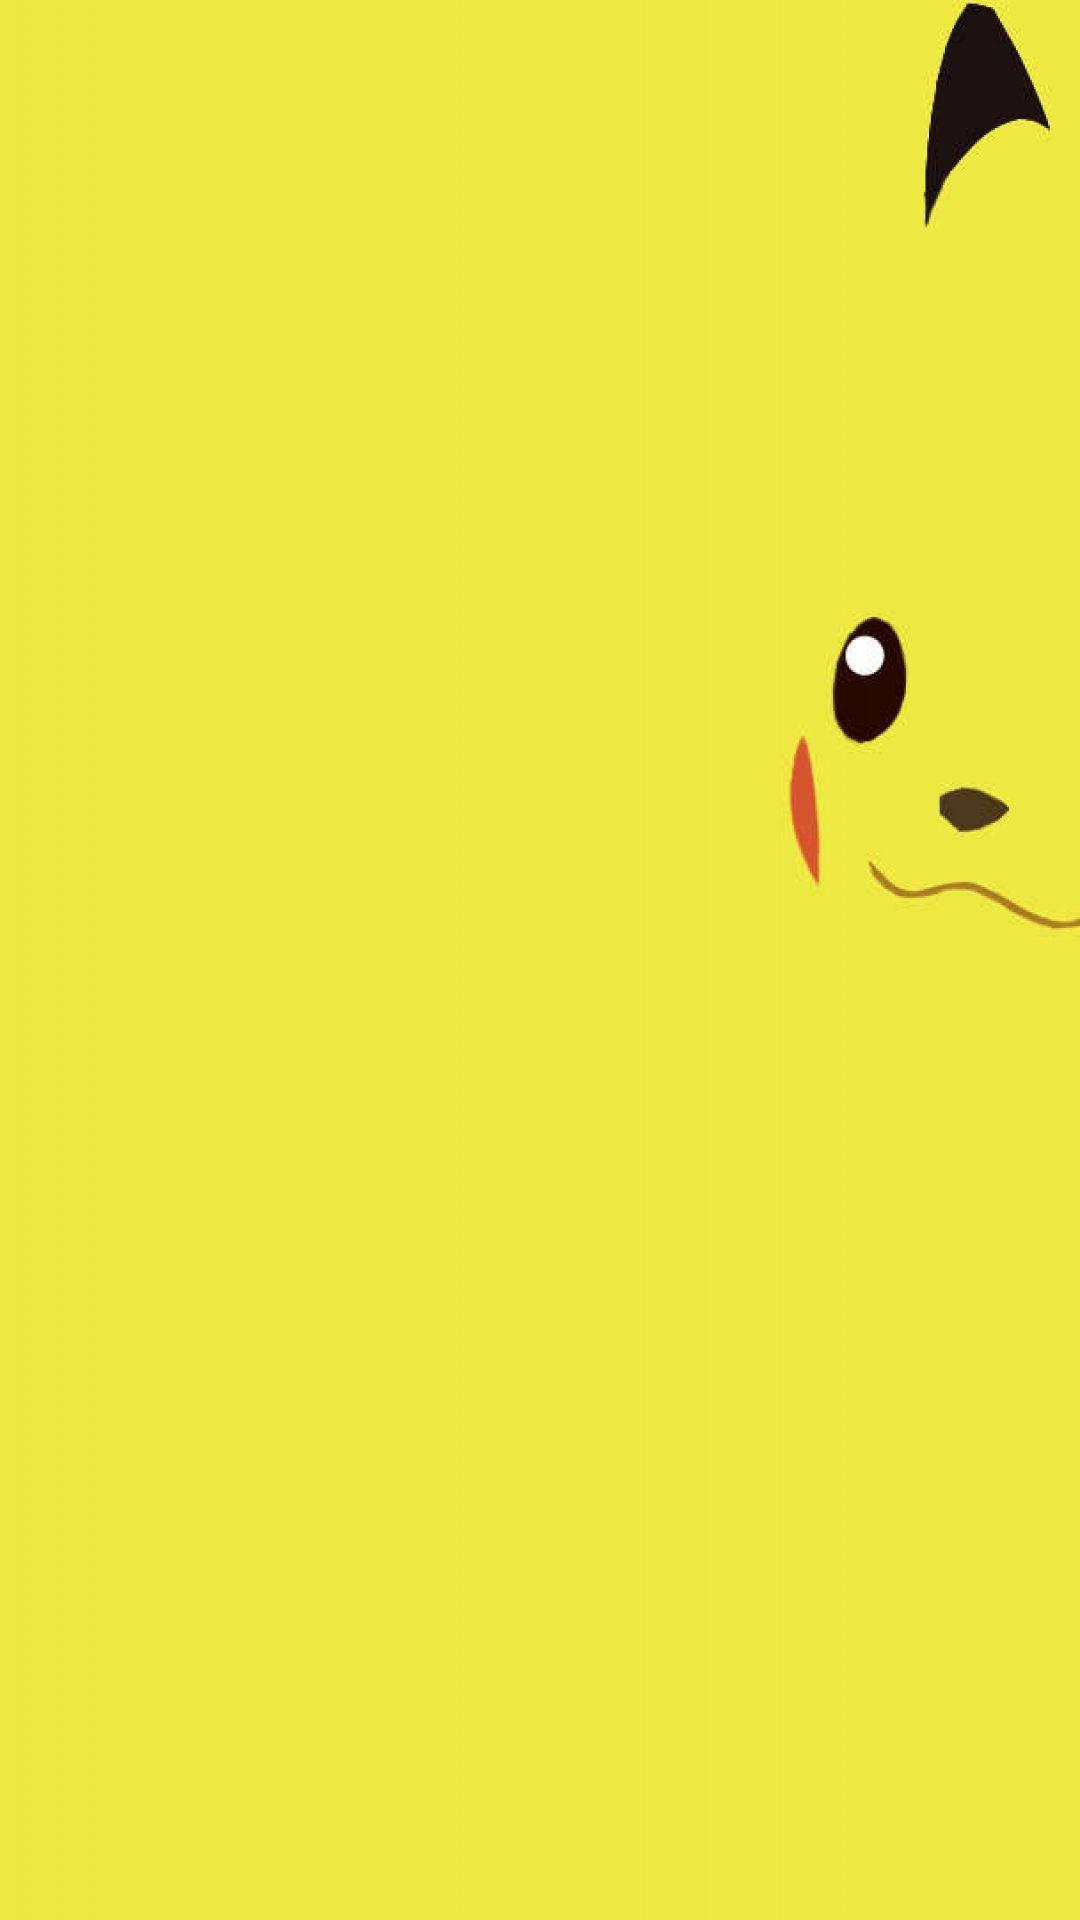 Cute Mustache Wallpaper Iphone Die 82 Besten Pikachu Wallpapers